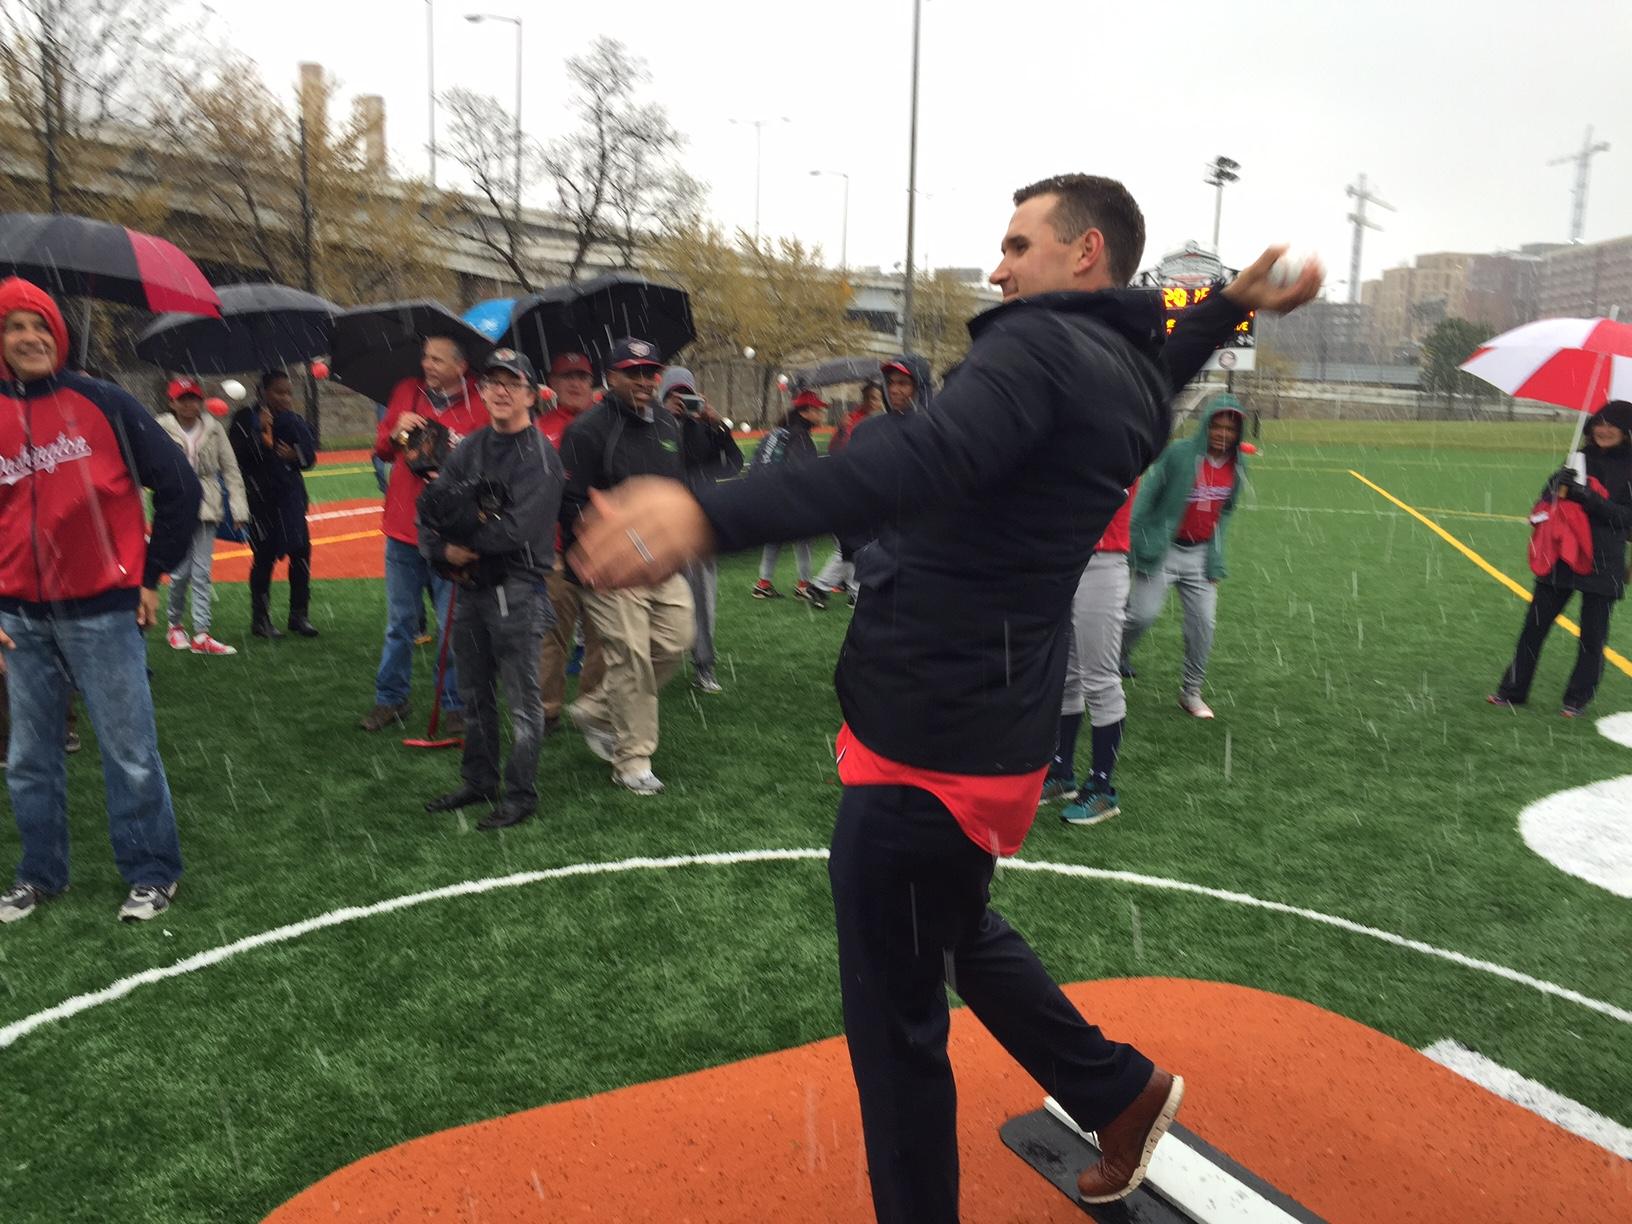 Photos: Ryan Zimmerman Field opens in D.C.